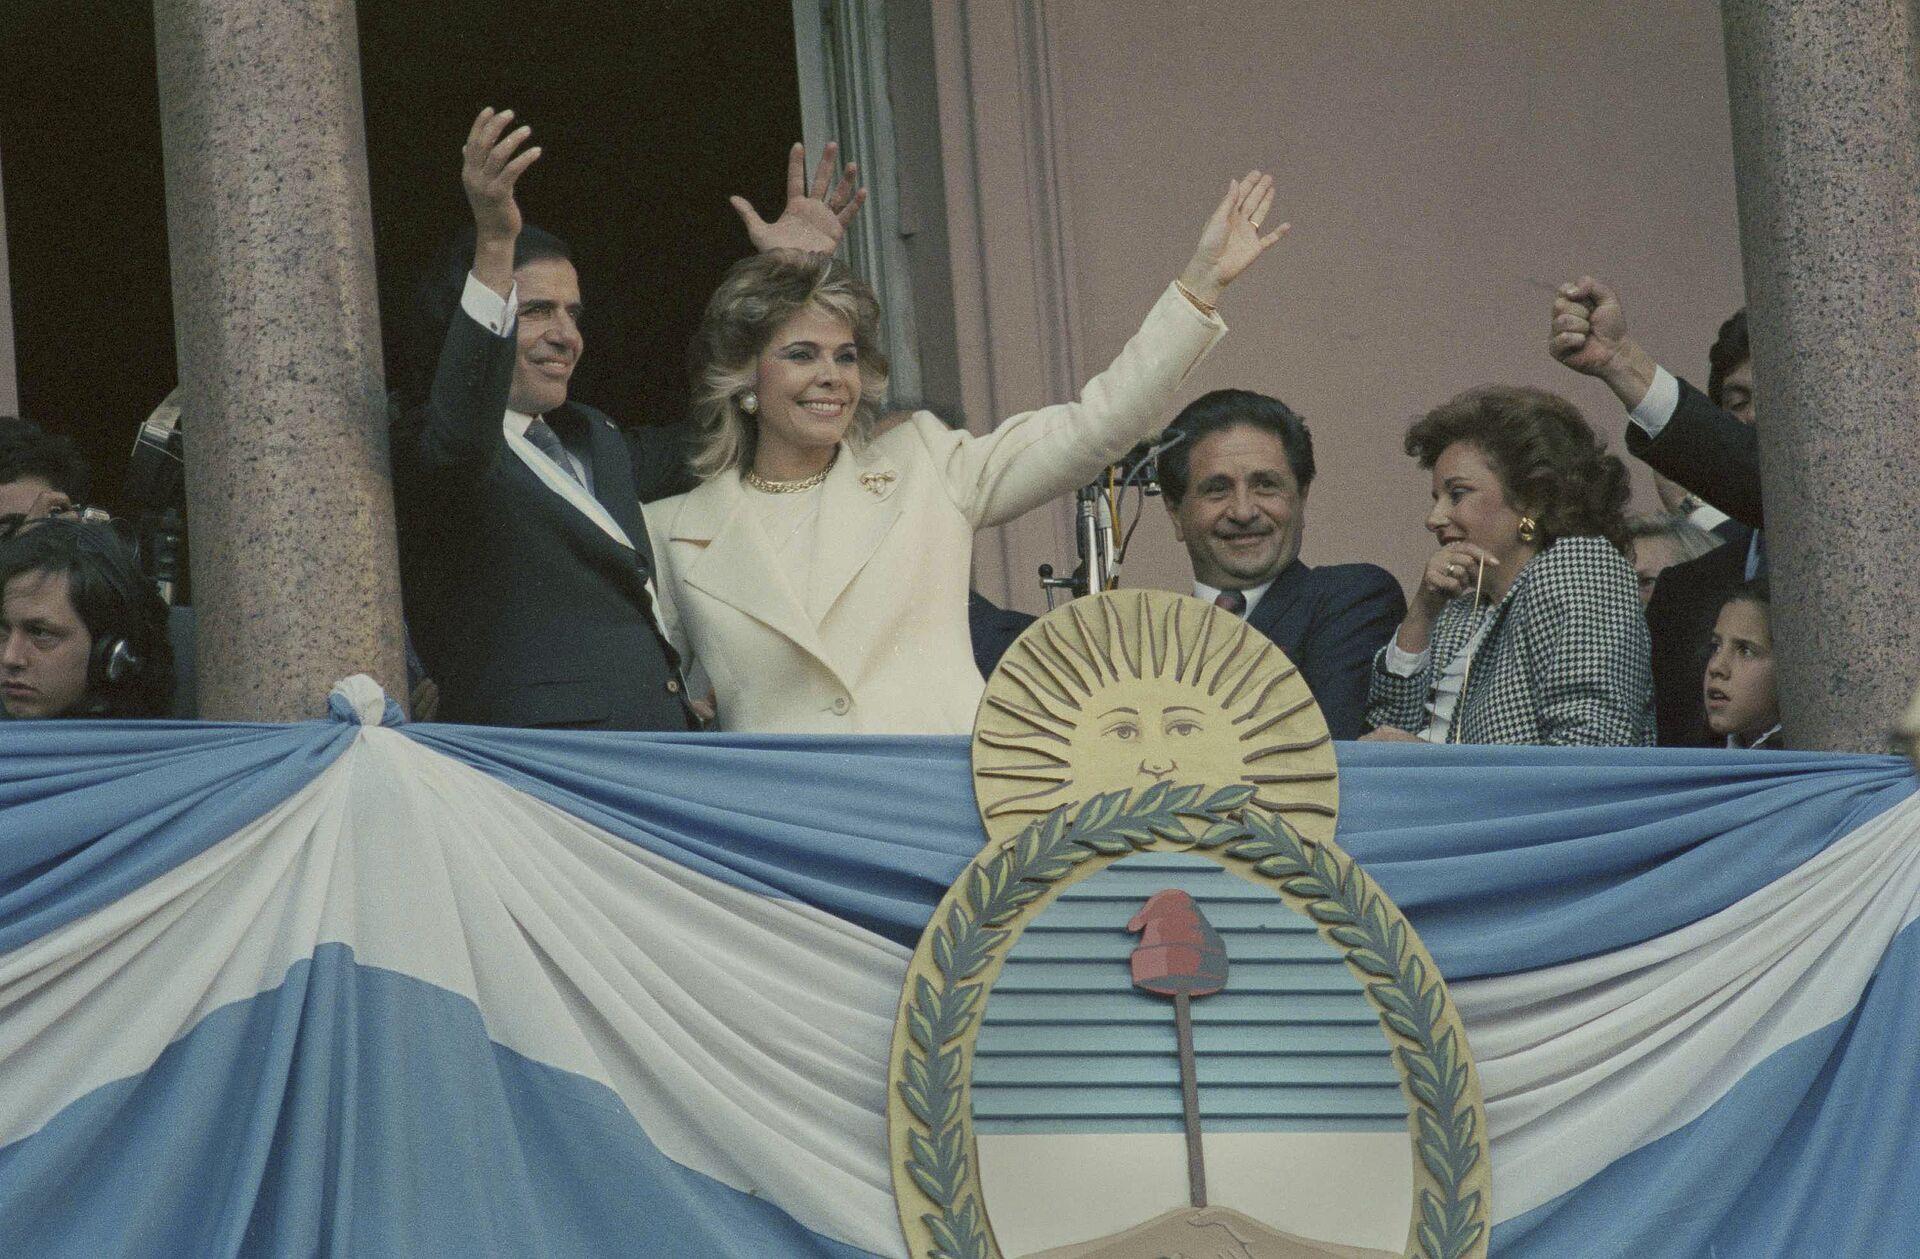 Carlos Menem, expresidente de Argentina y su exesposa, Zulema Yoma (archivo) - Sputnik Mundo, 1920, 11.02.2021